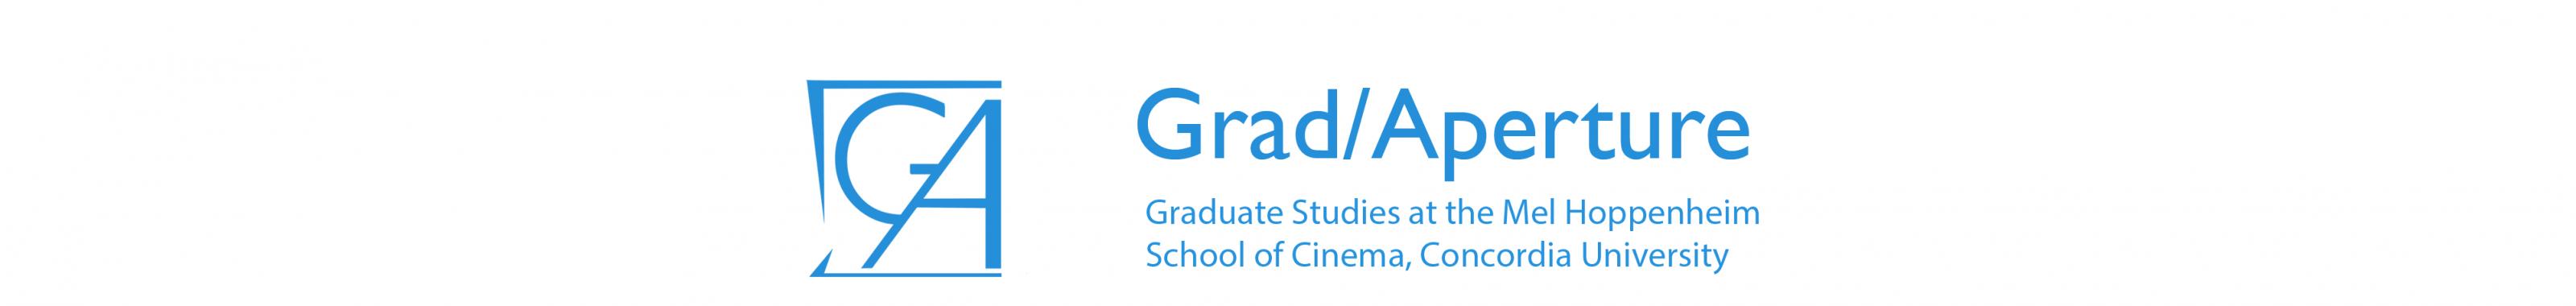 Grad/Aperture